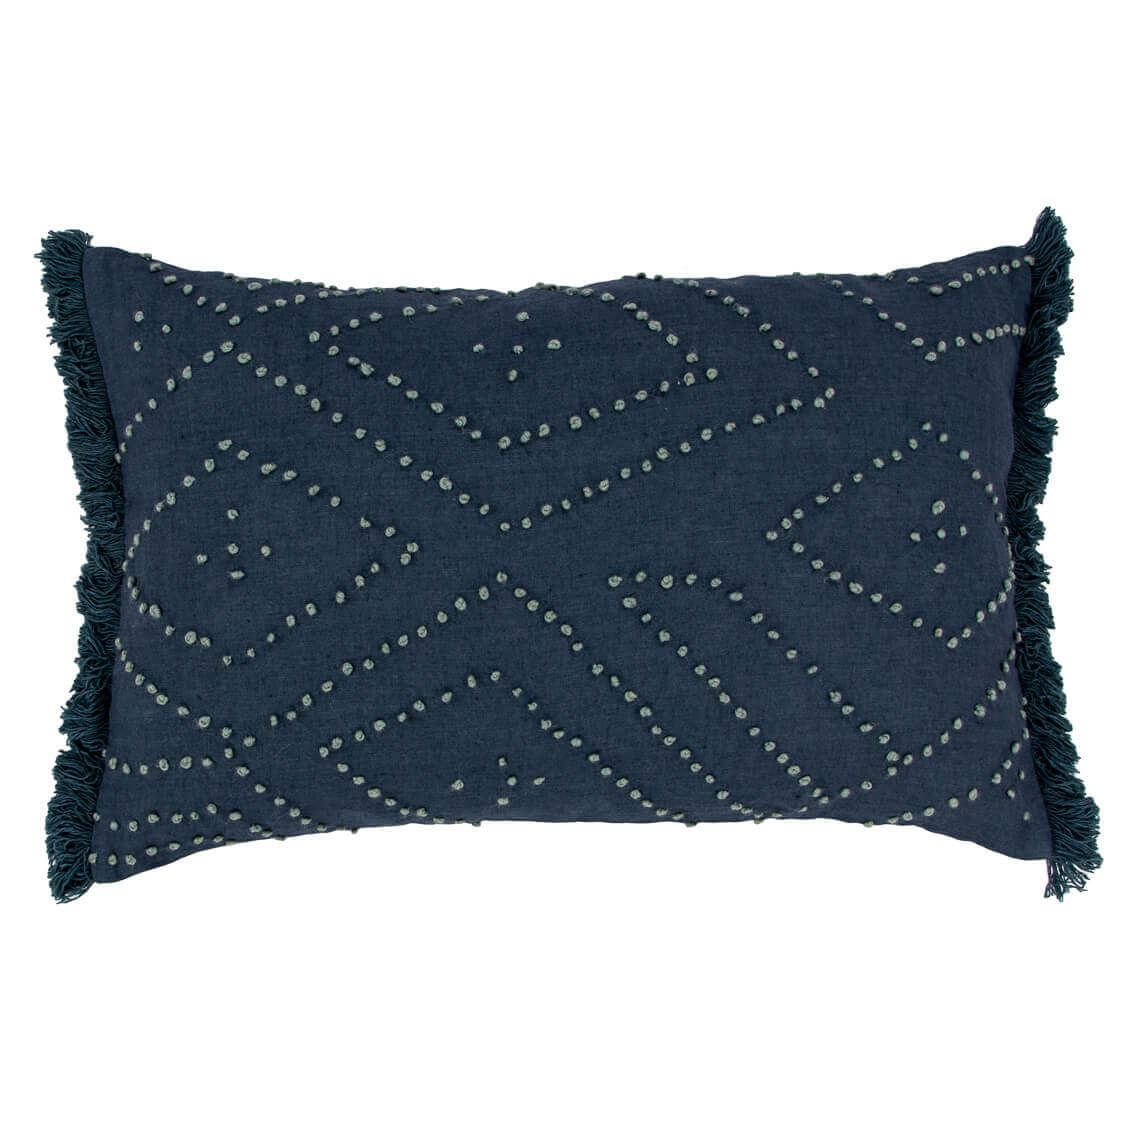 Lenzo Cushion, Navy Size W 35cm x D 55cm x H 14cm in Navy Blue 50%cotton/50%linen Freedom